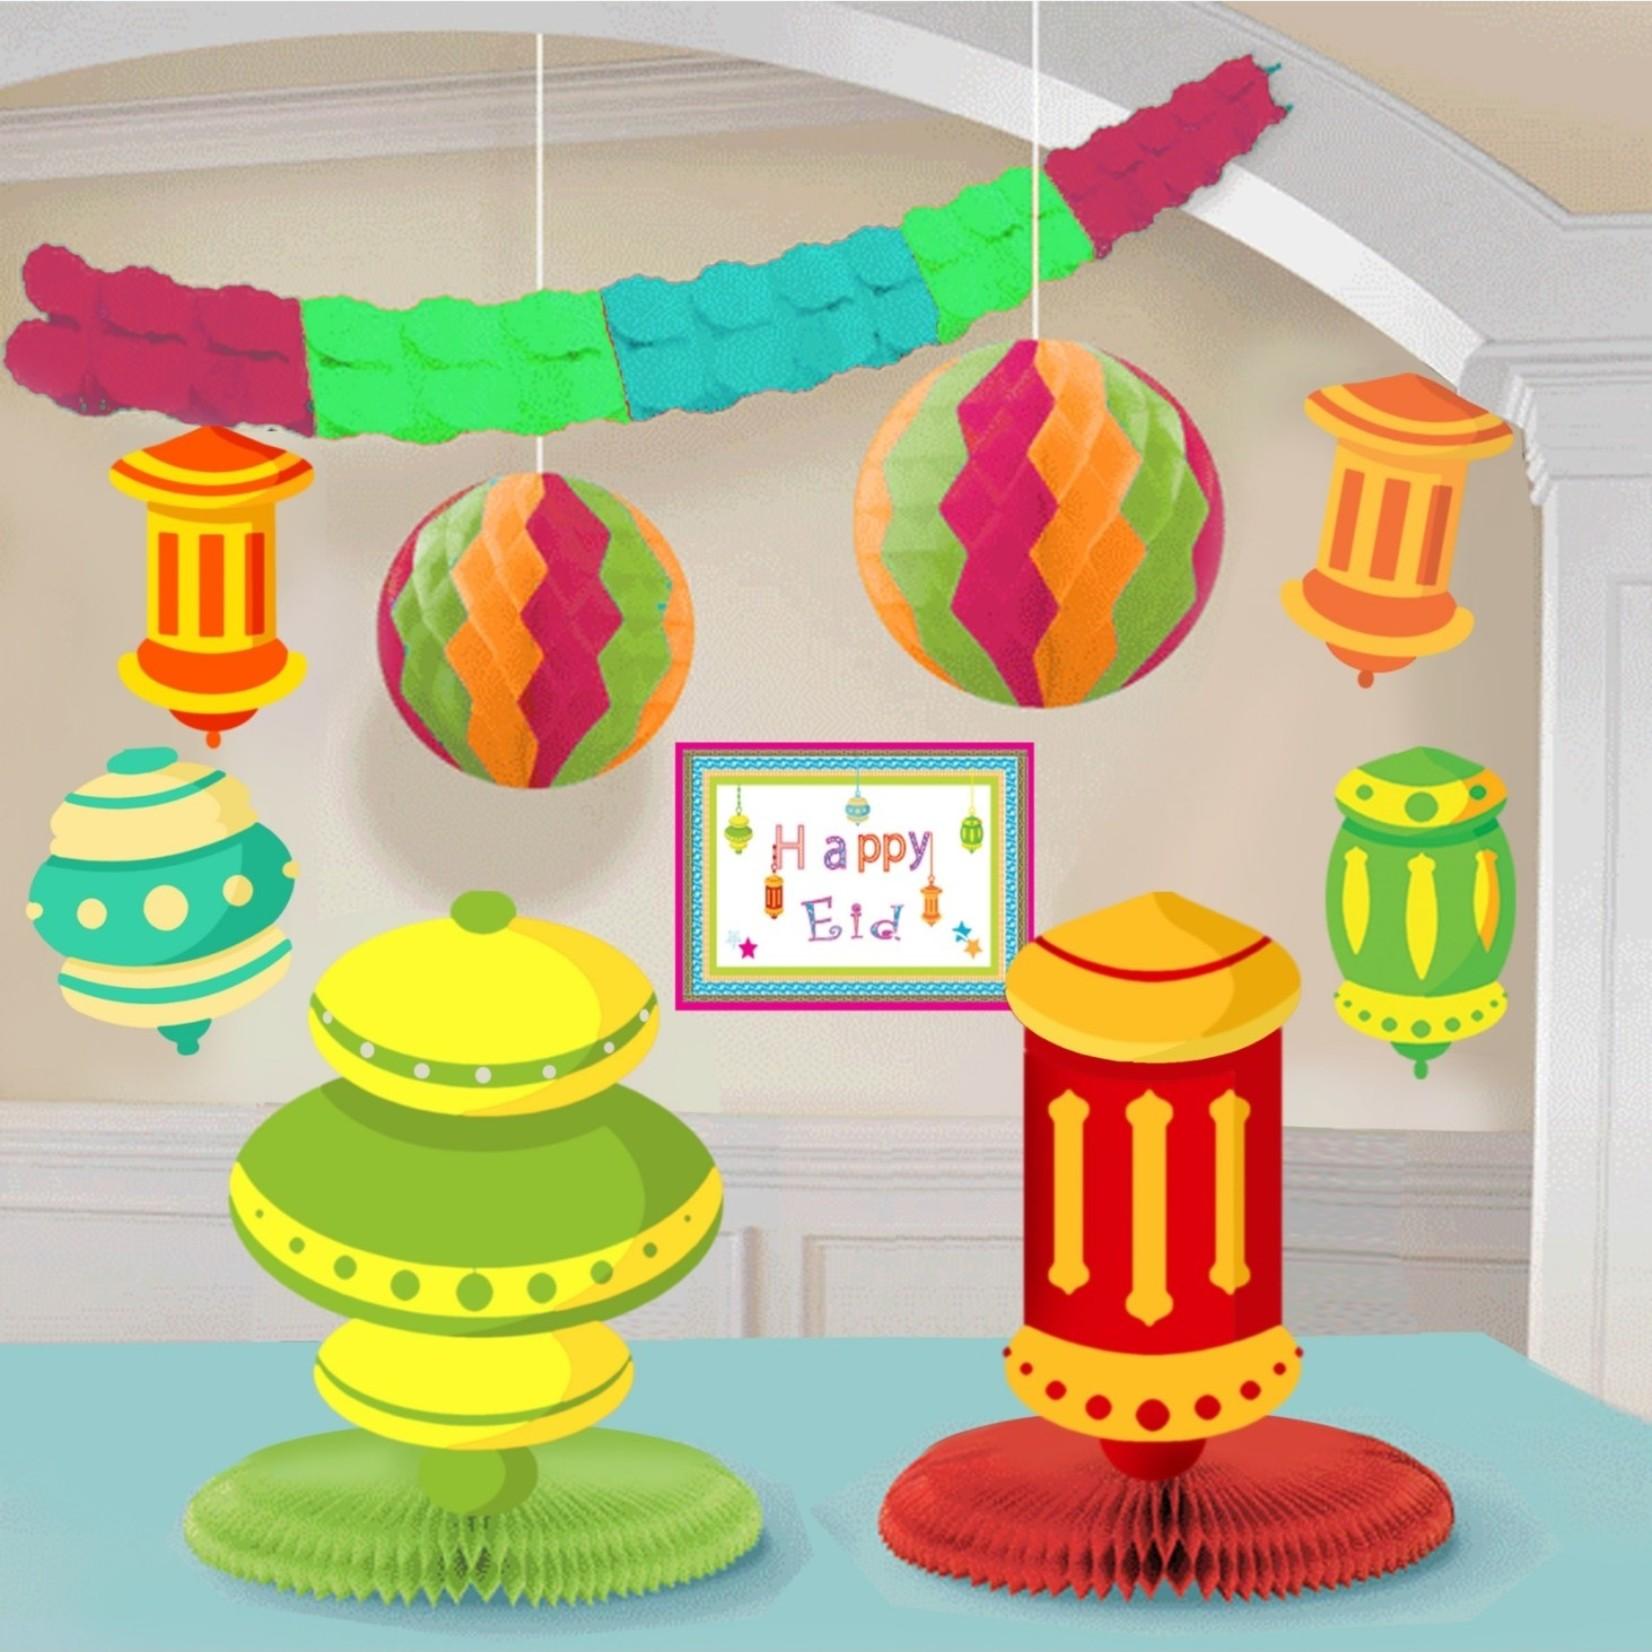 Eid Creations Ornament Decoration Kit